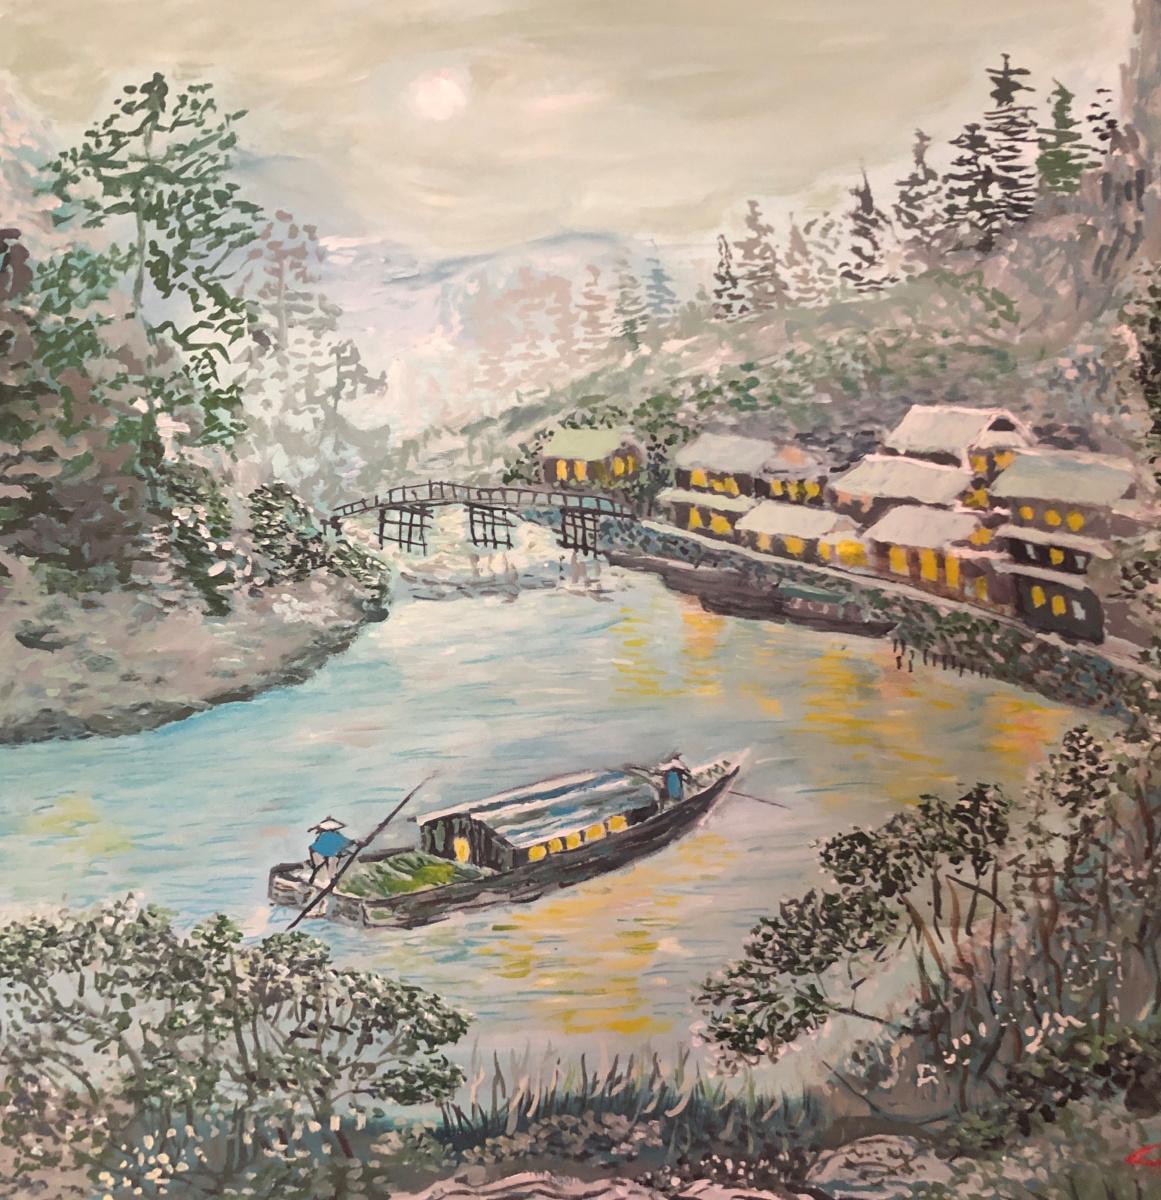 Sergey Vladimirovich Sebini. Moonlight landscape. Variation on the theme of Keukei Kojima